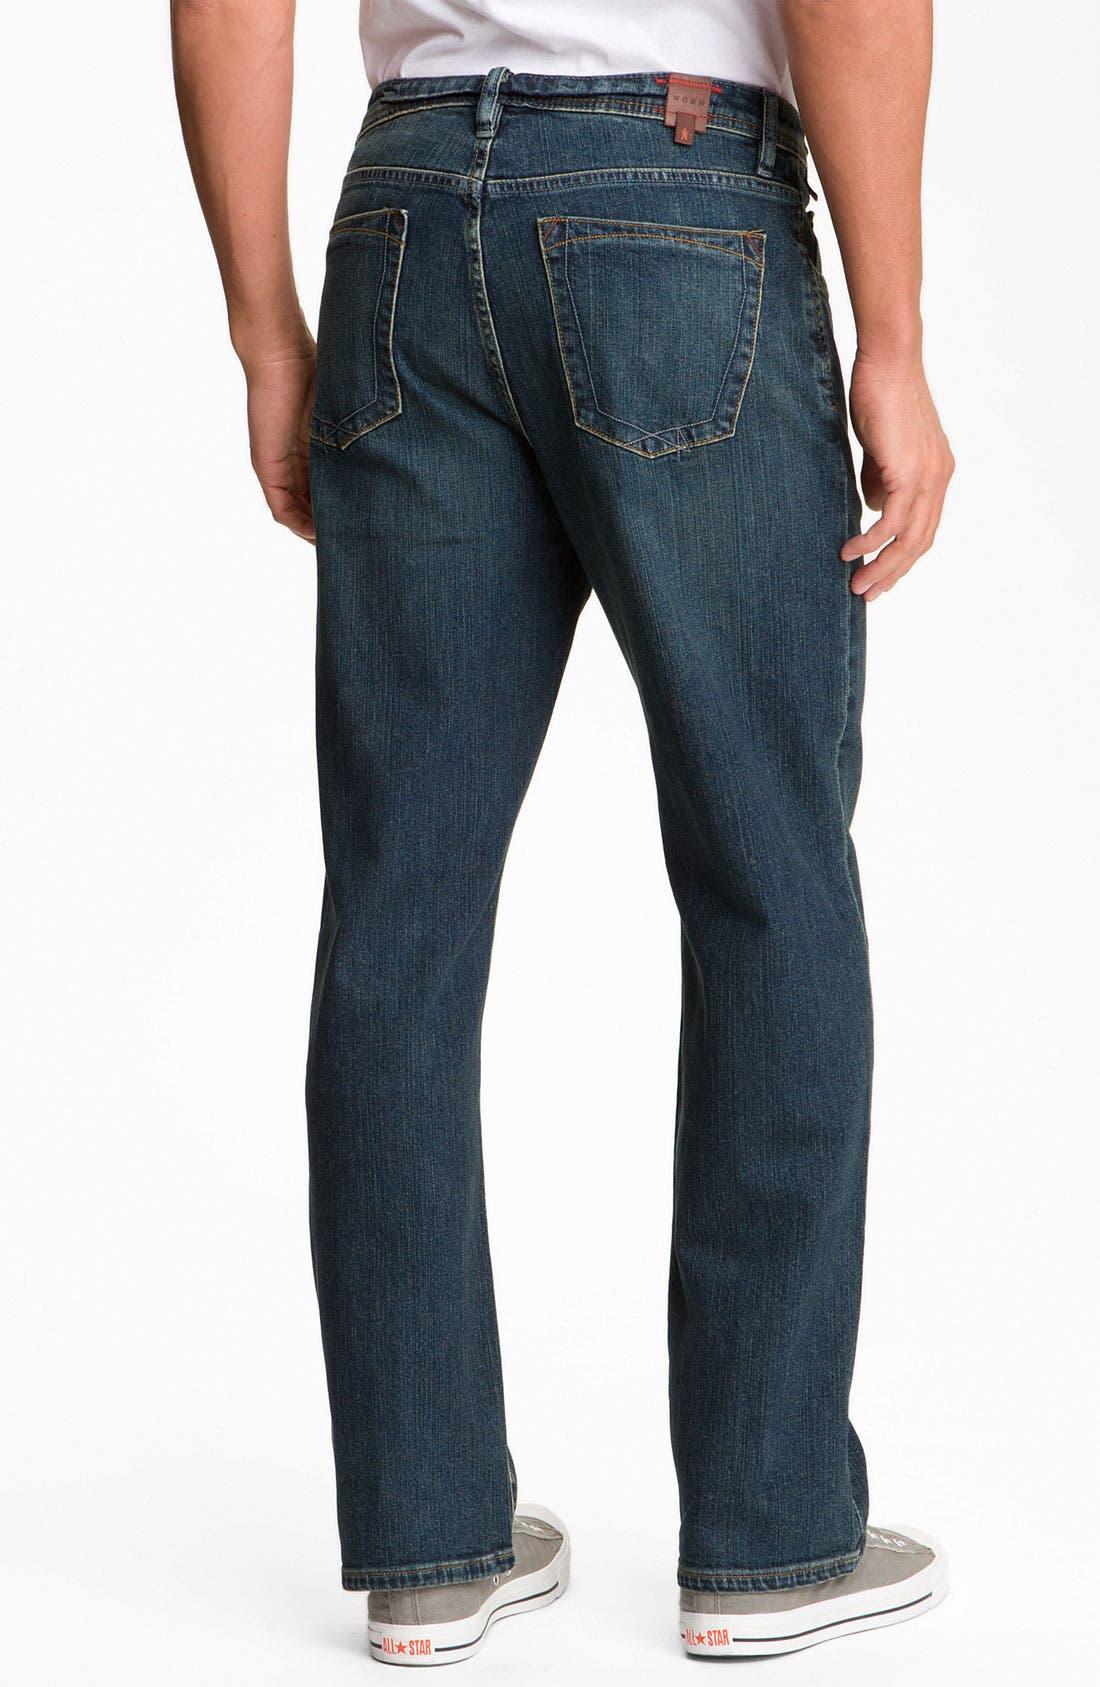 Alternate Image 2  - Worn Jeans 'Octane' Straight Leg Jeans (Dark Edge)